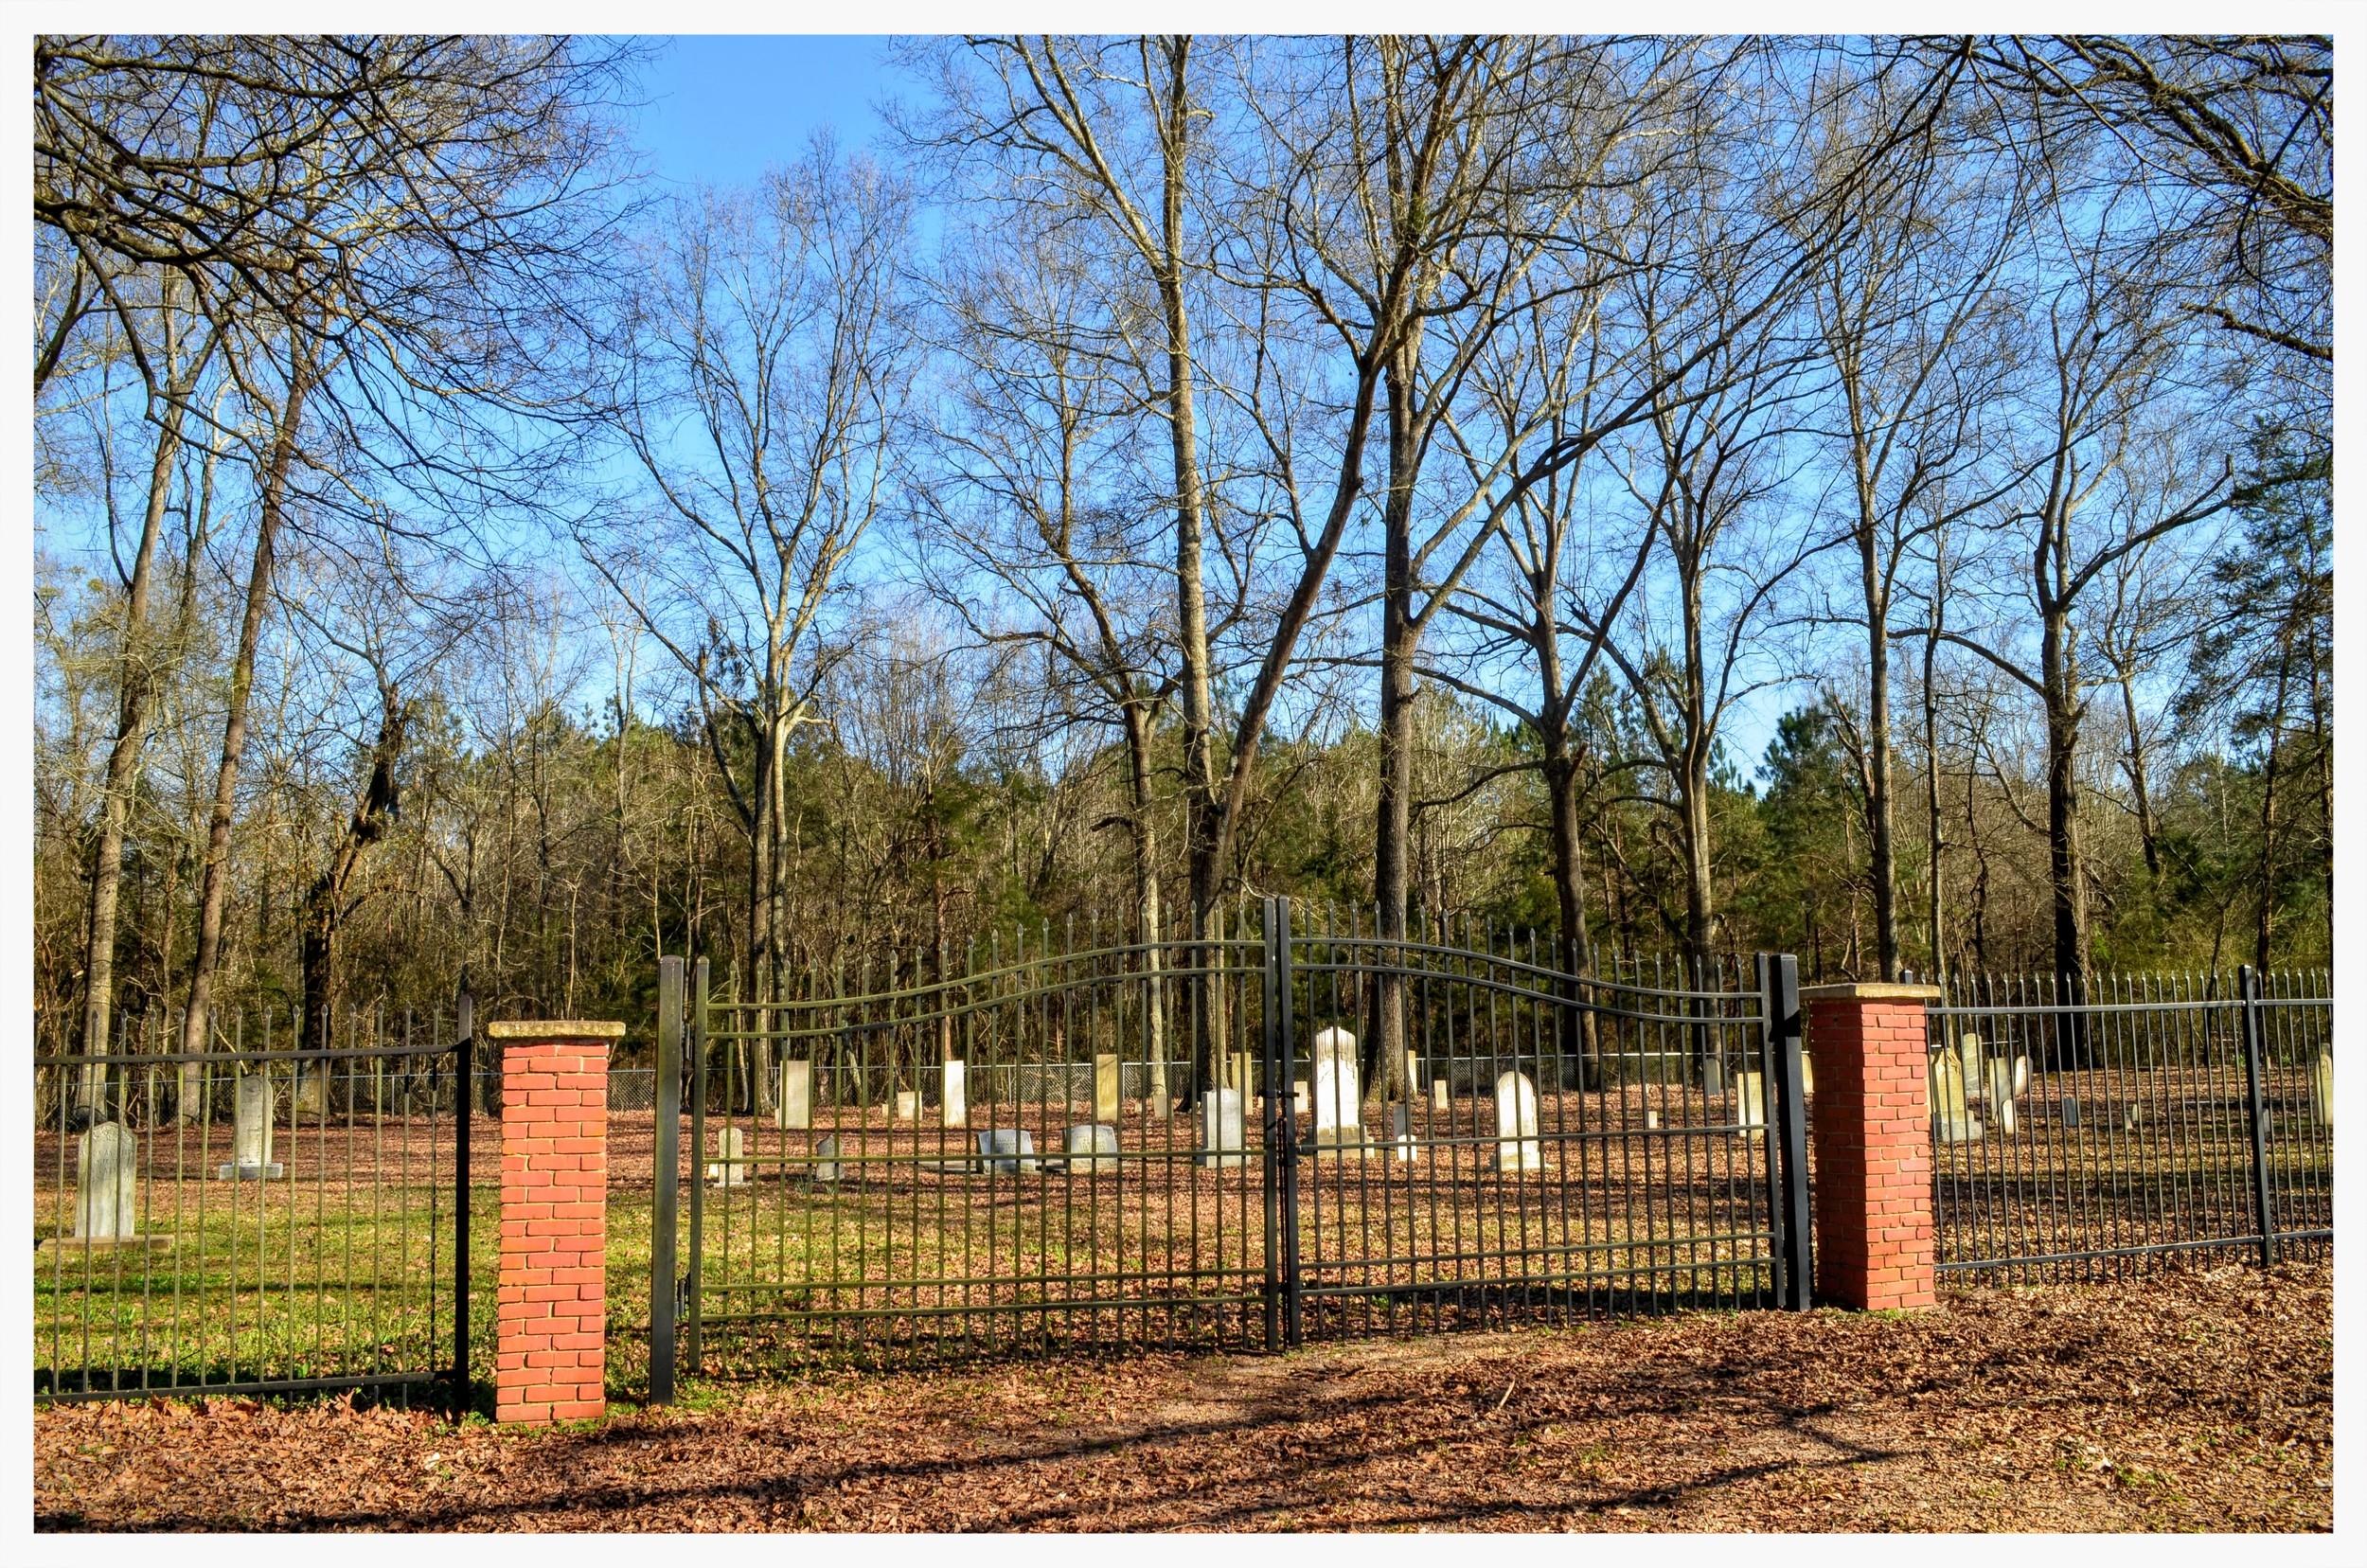 Bethel Cemetery gate, Pintlala, Montgomery County, Alabama